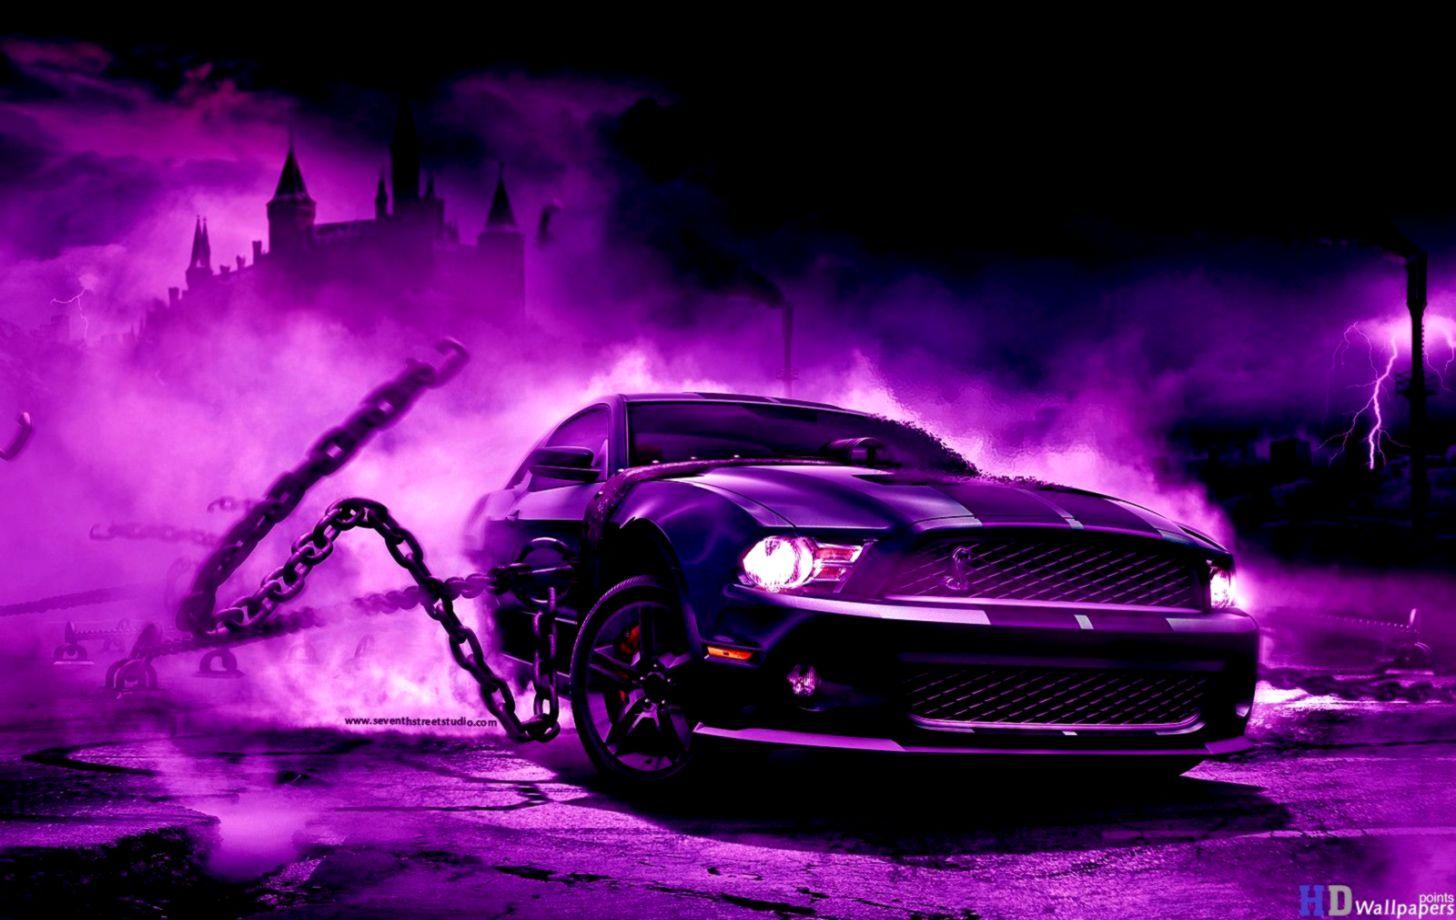 Cool Car 3d Wallpapers Hd Background Desktop Wallpaper